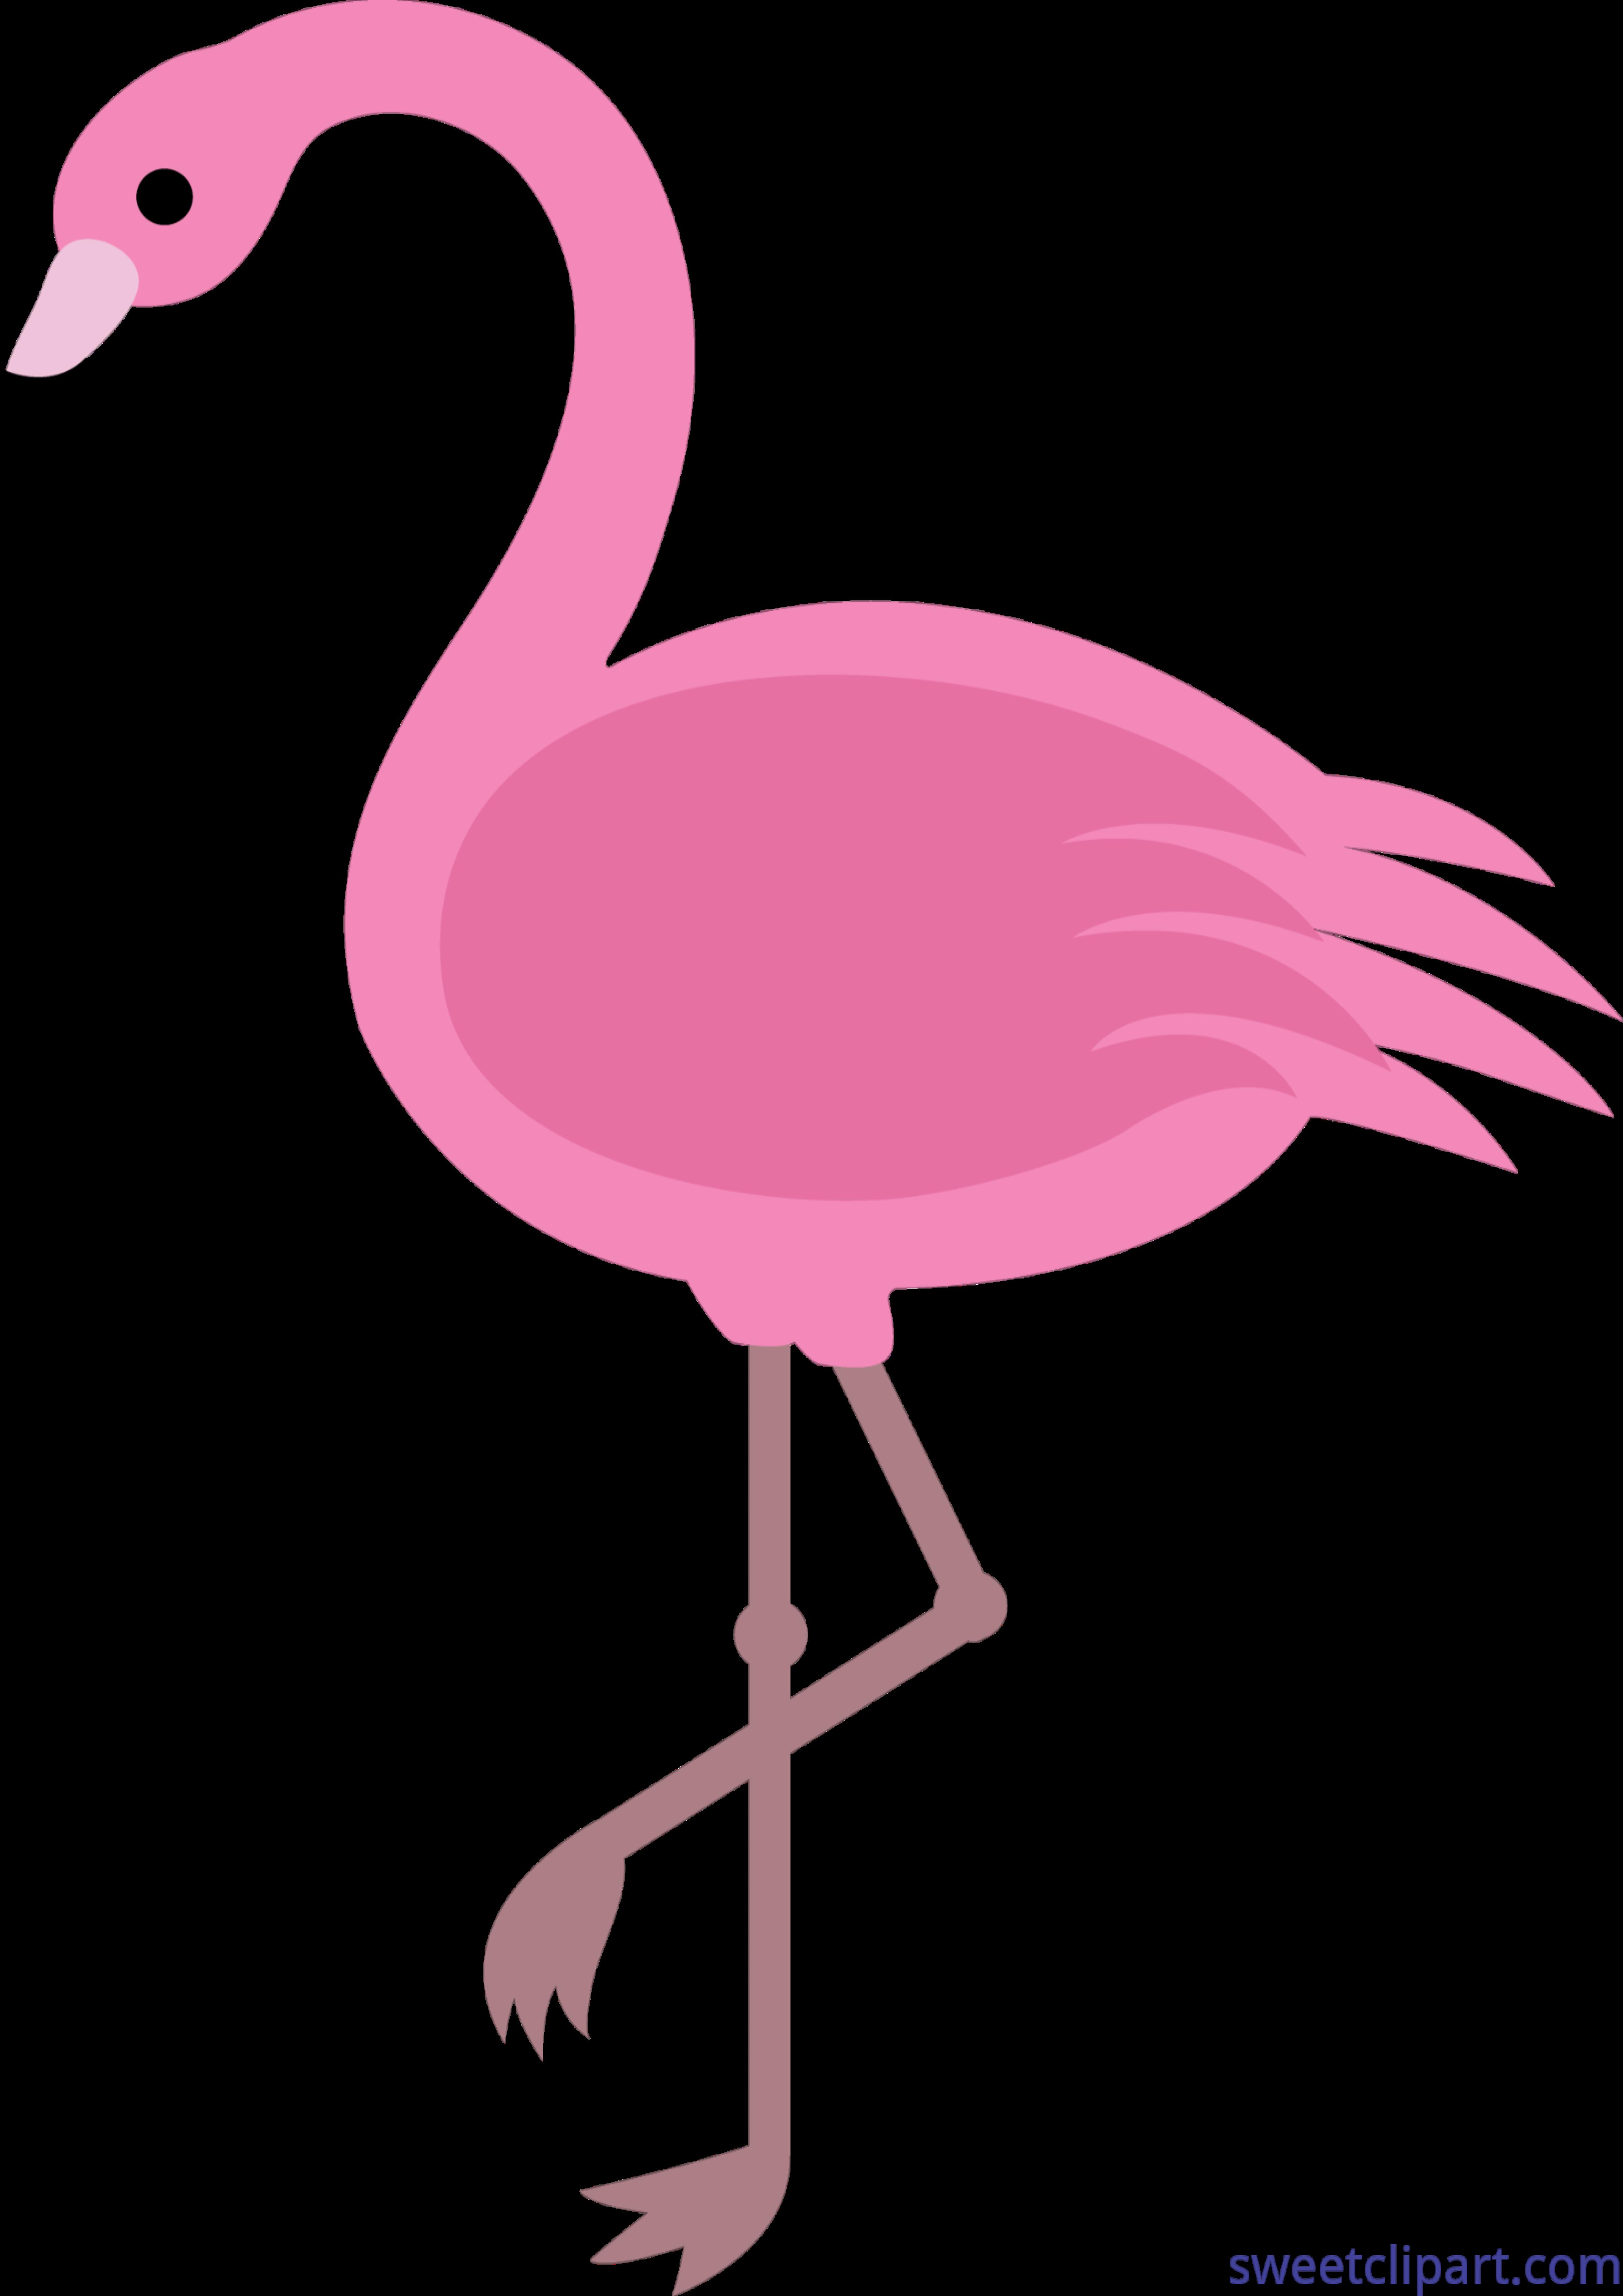 Картинки розового цвета для детей